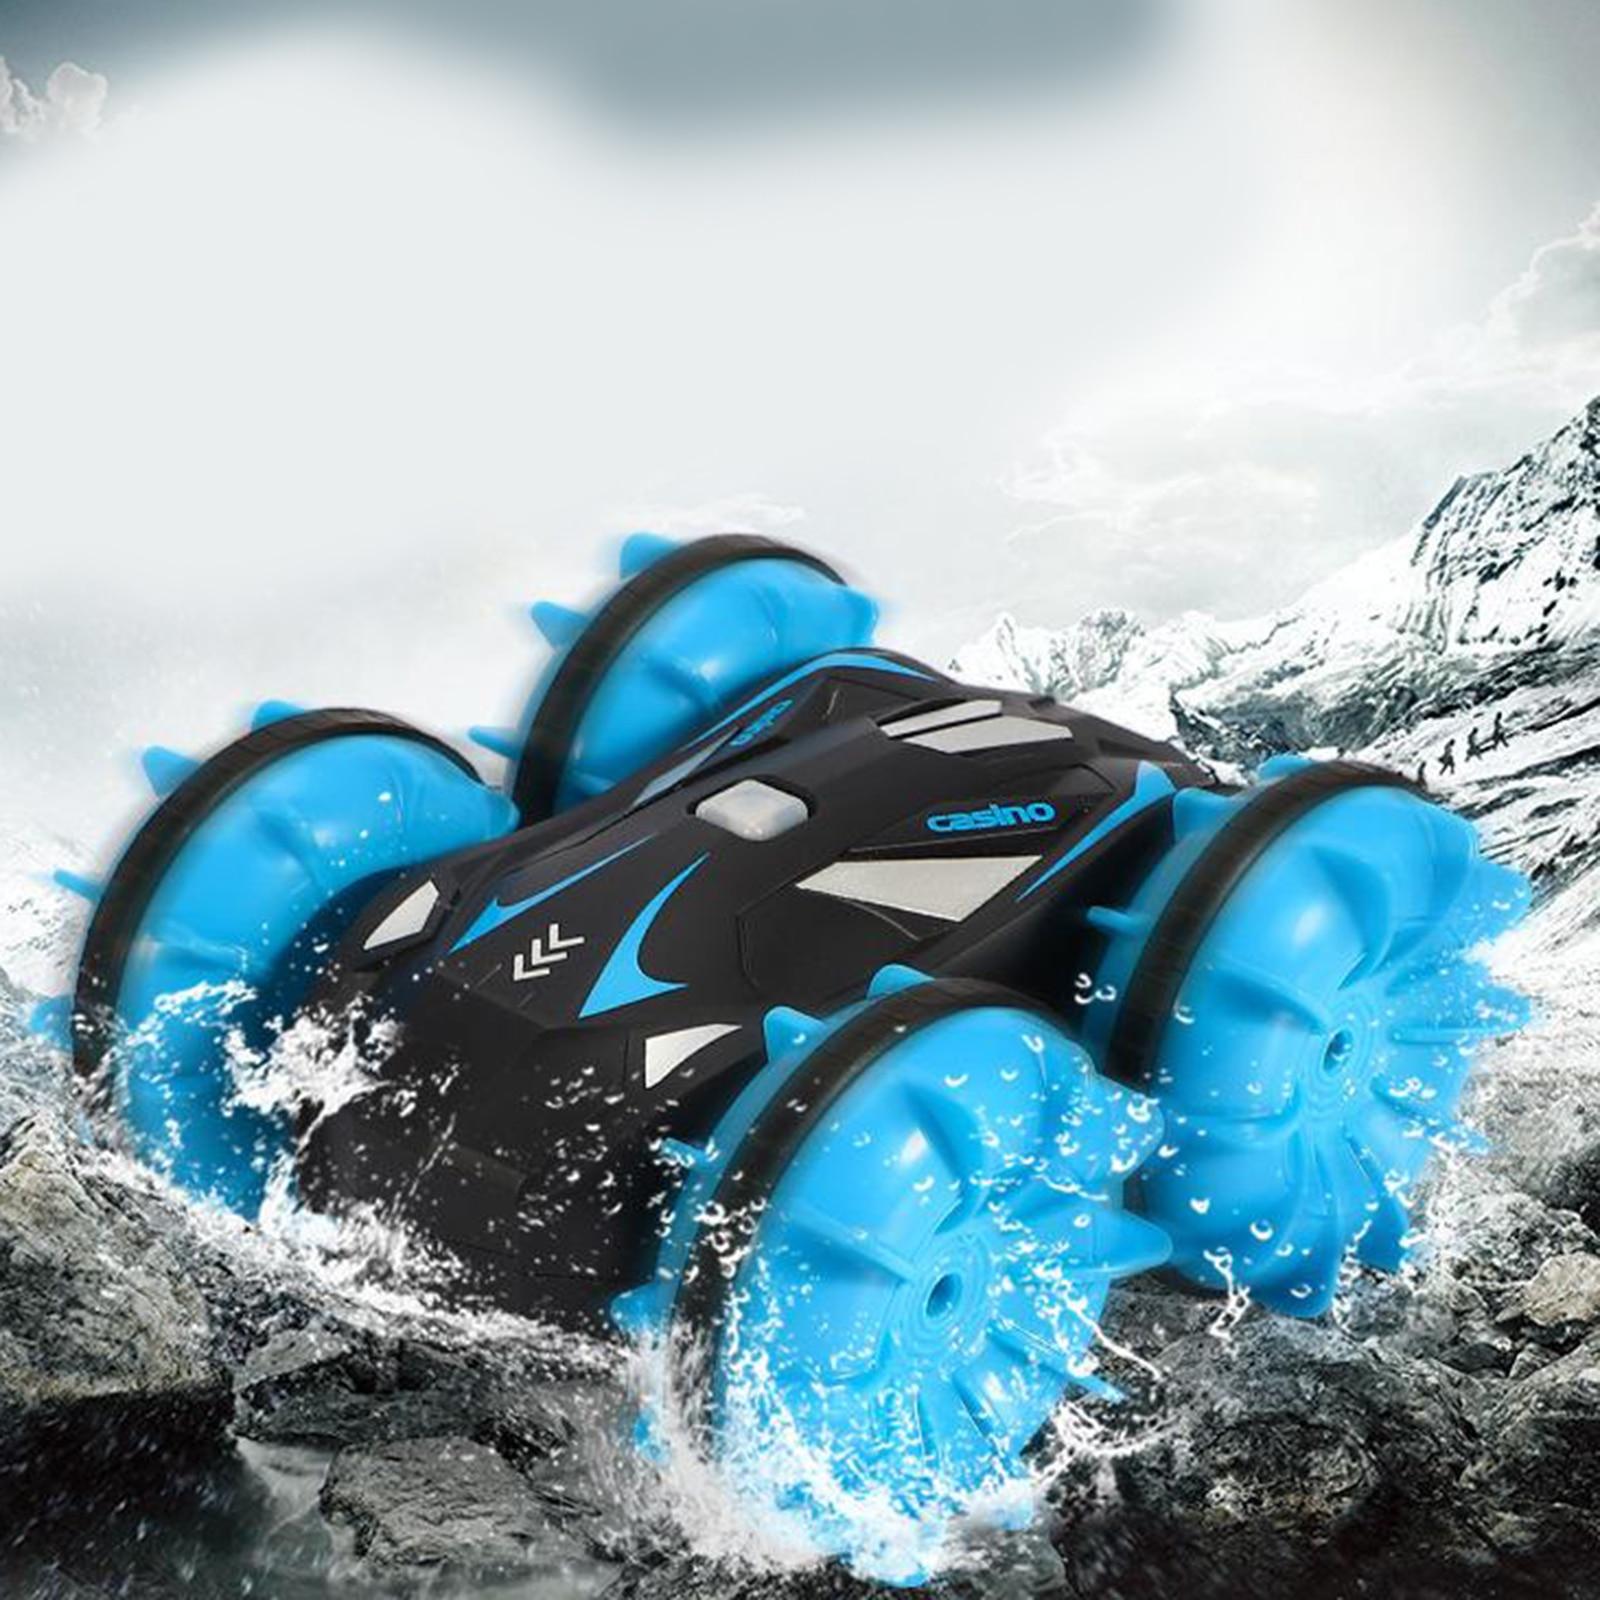 Waterproof 1/20 RC Stunt Car Monster Truck Rechargeable Age 6+ Boy Girl enlarge